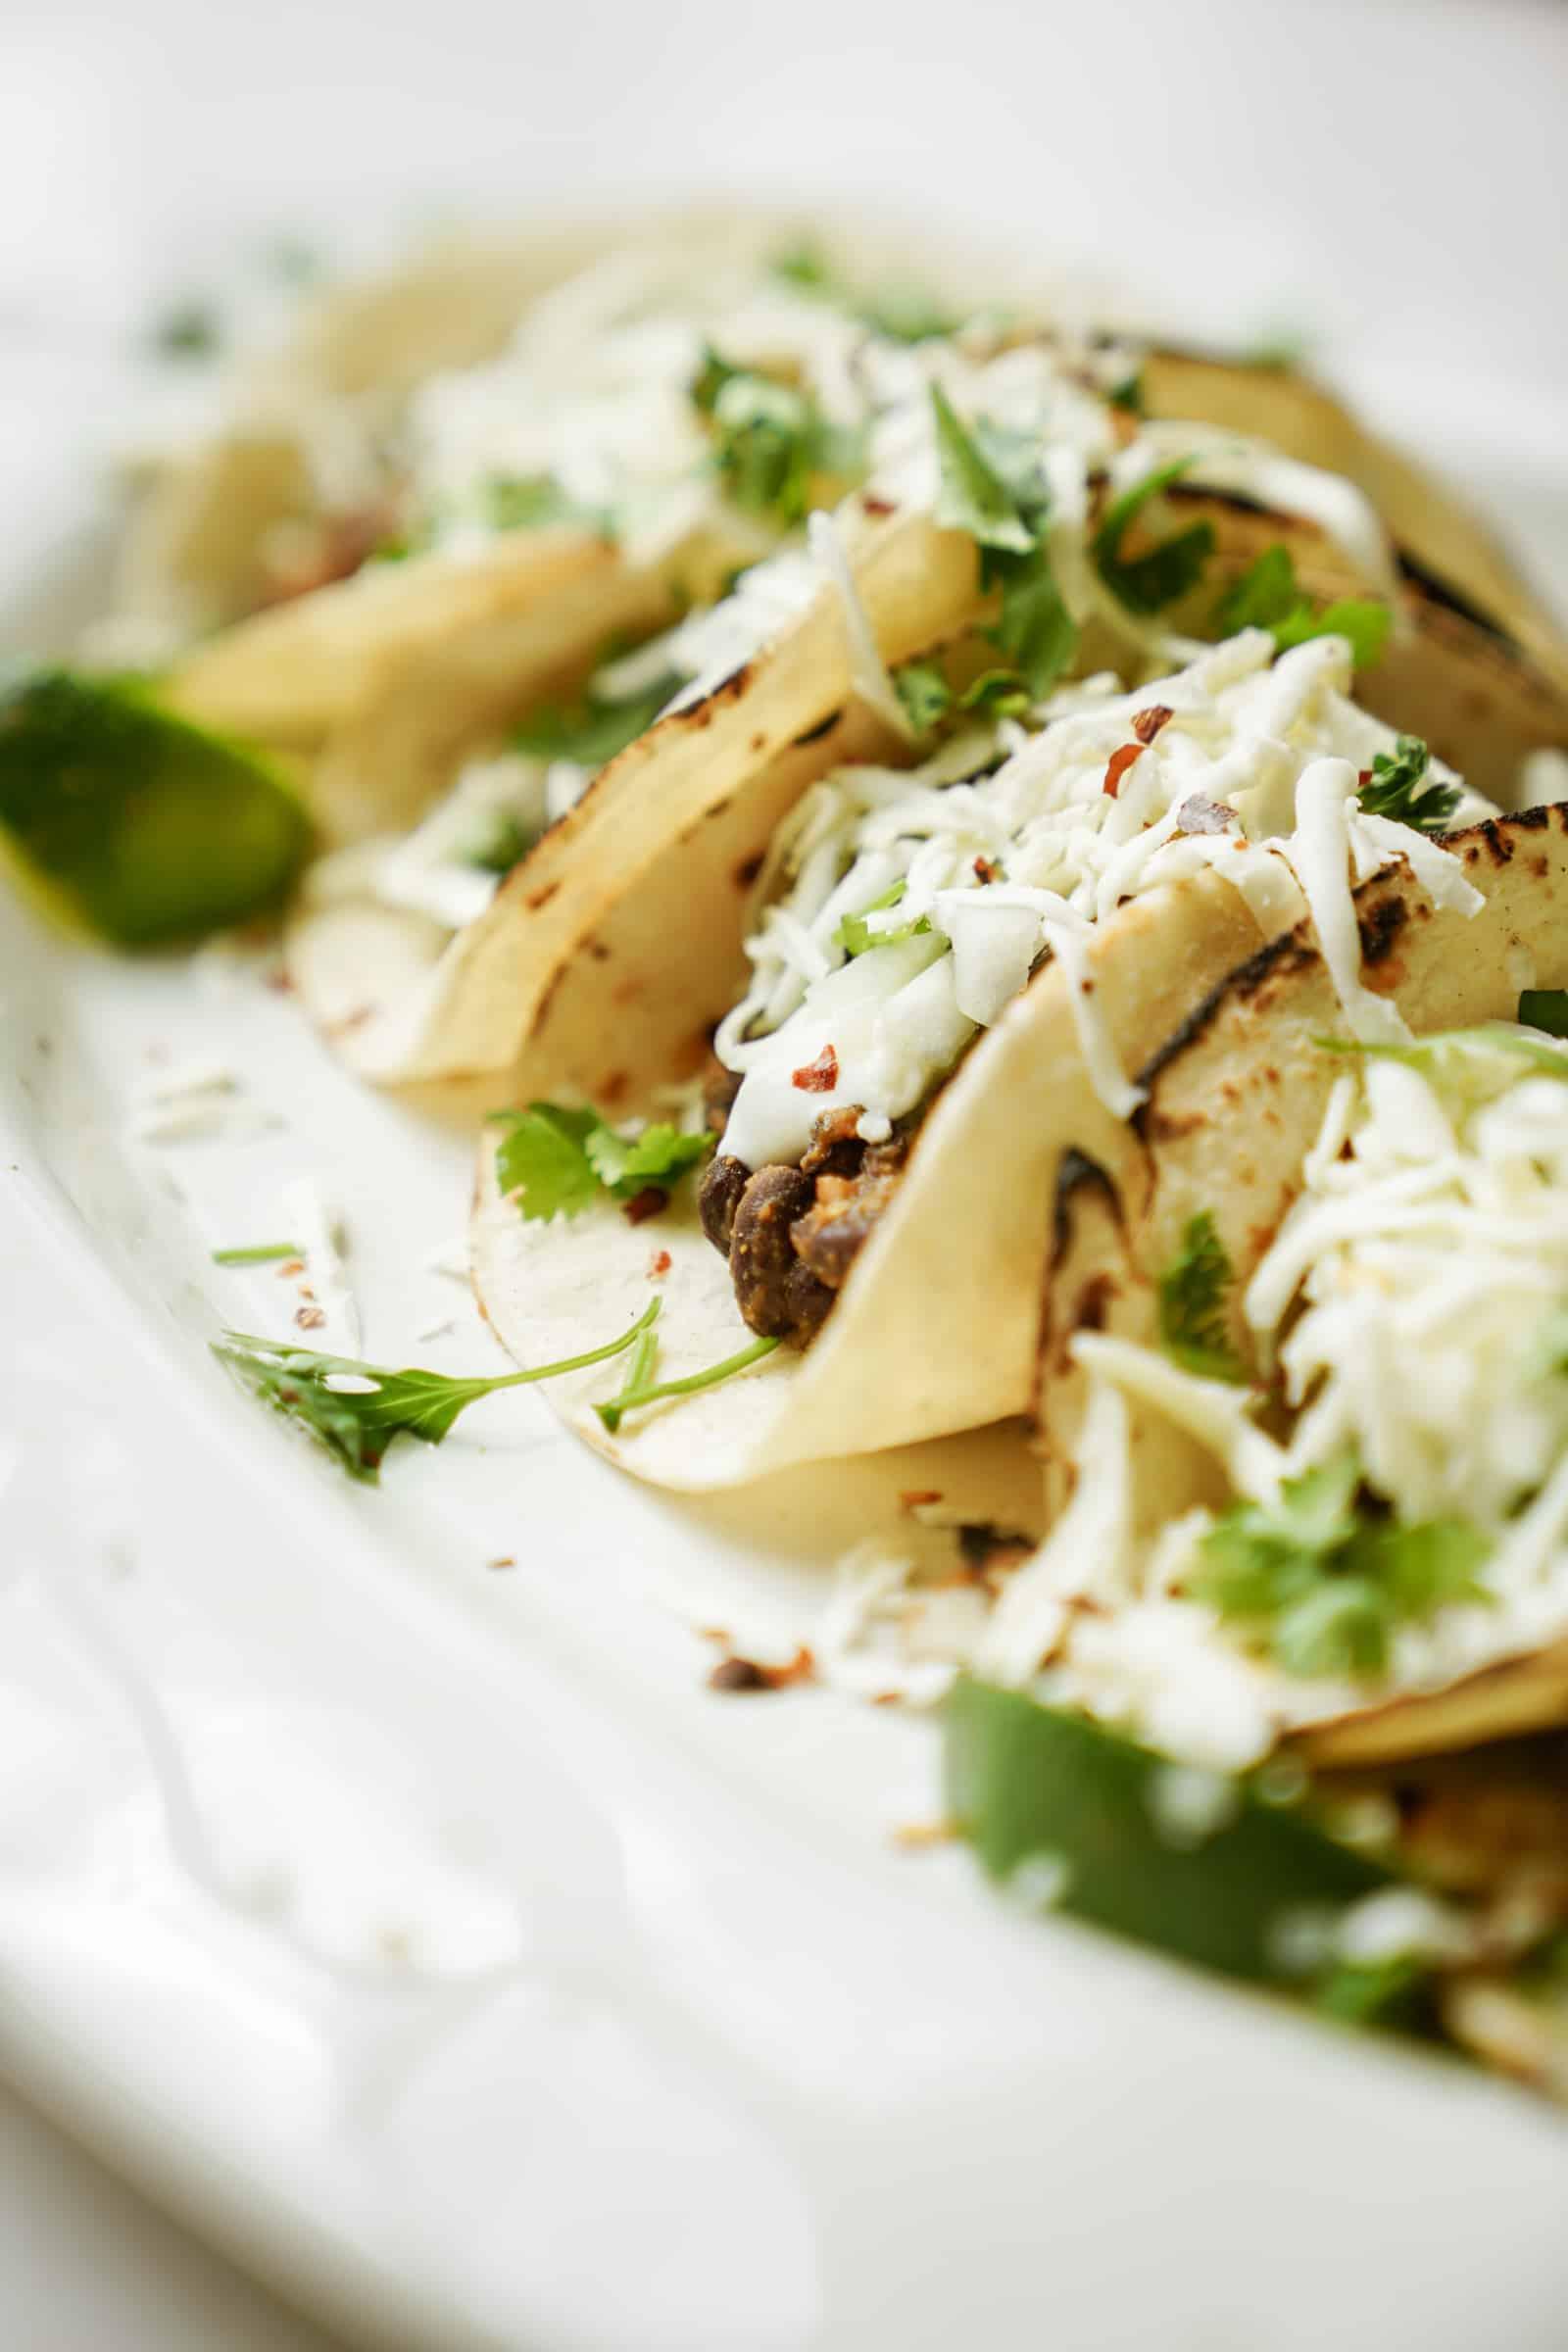 Vegetarian black bean tacos close-up